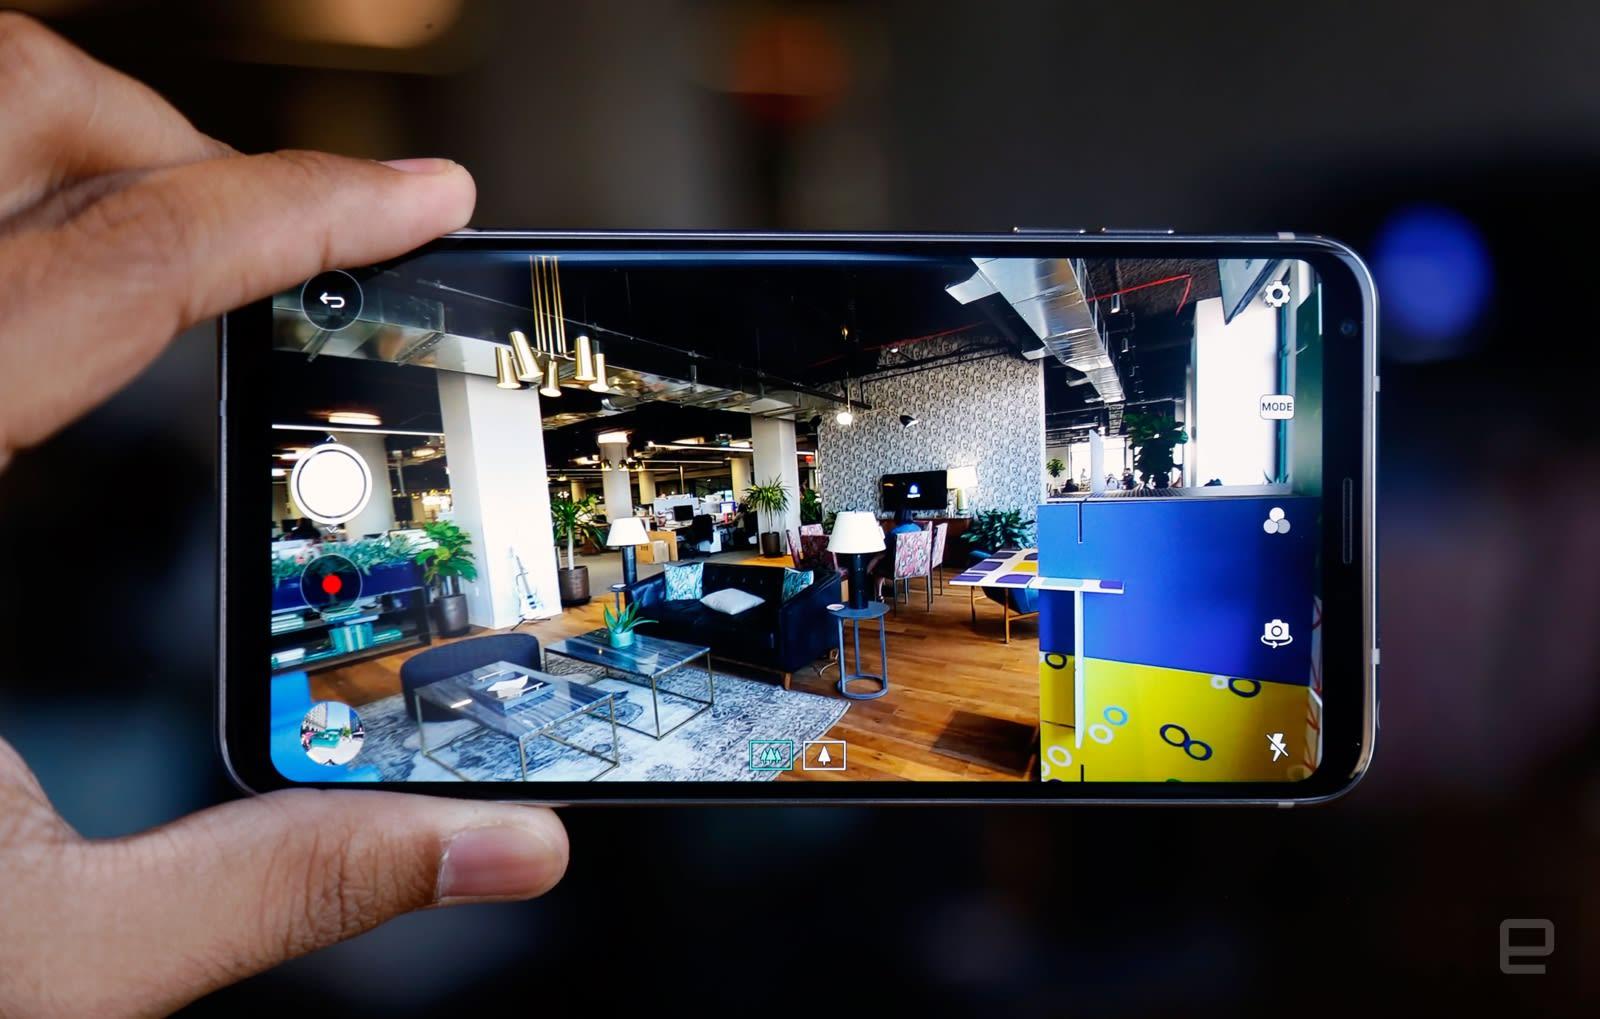 LG V30 review: LG's latest flagship needs more polish